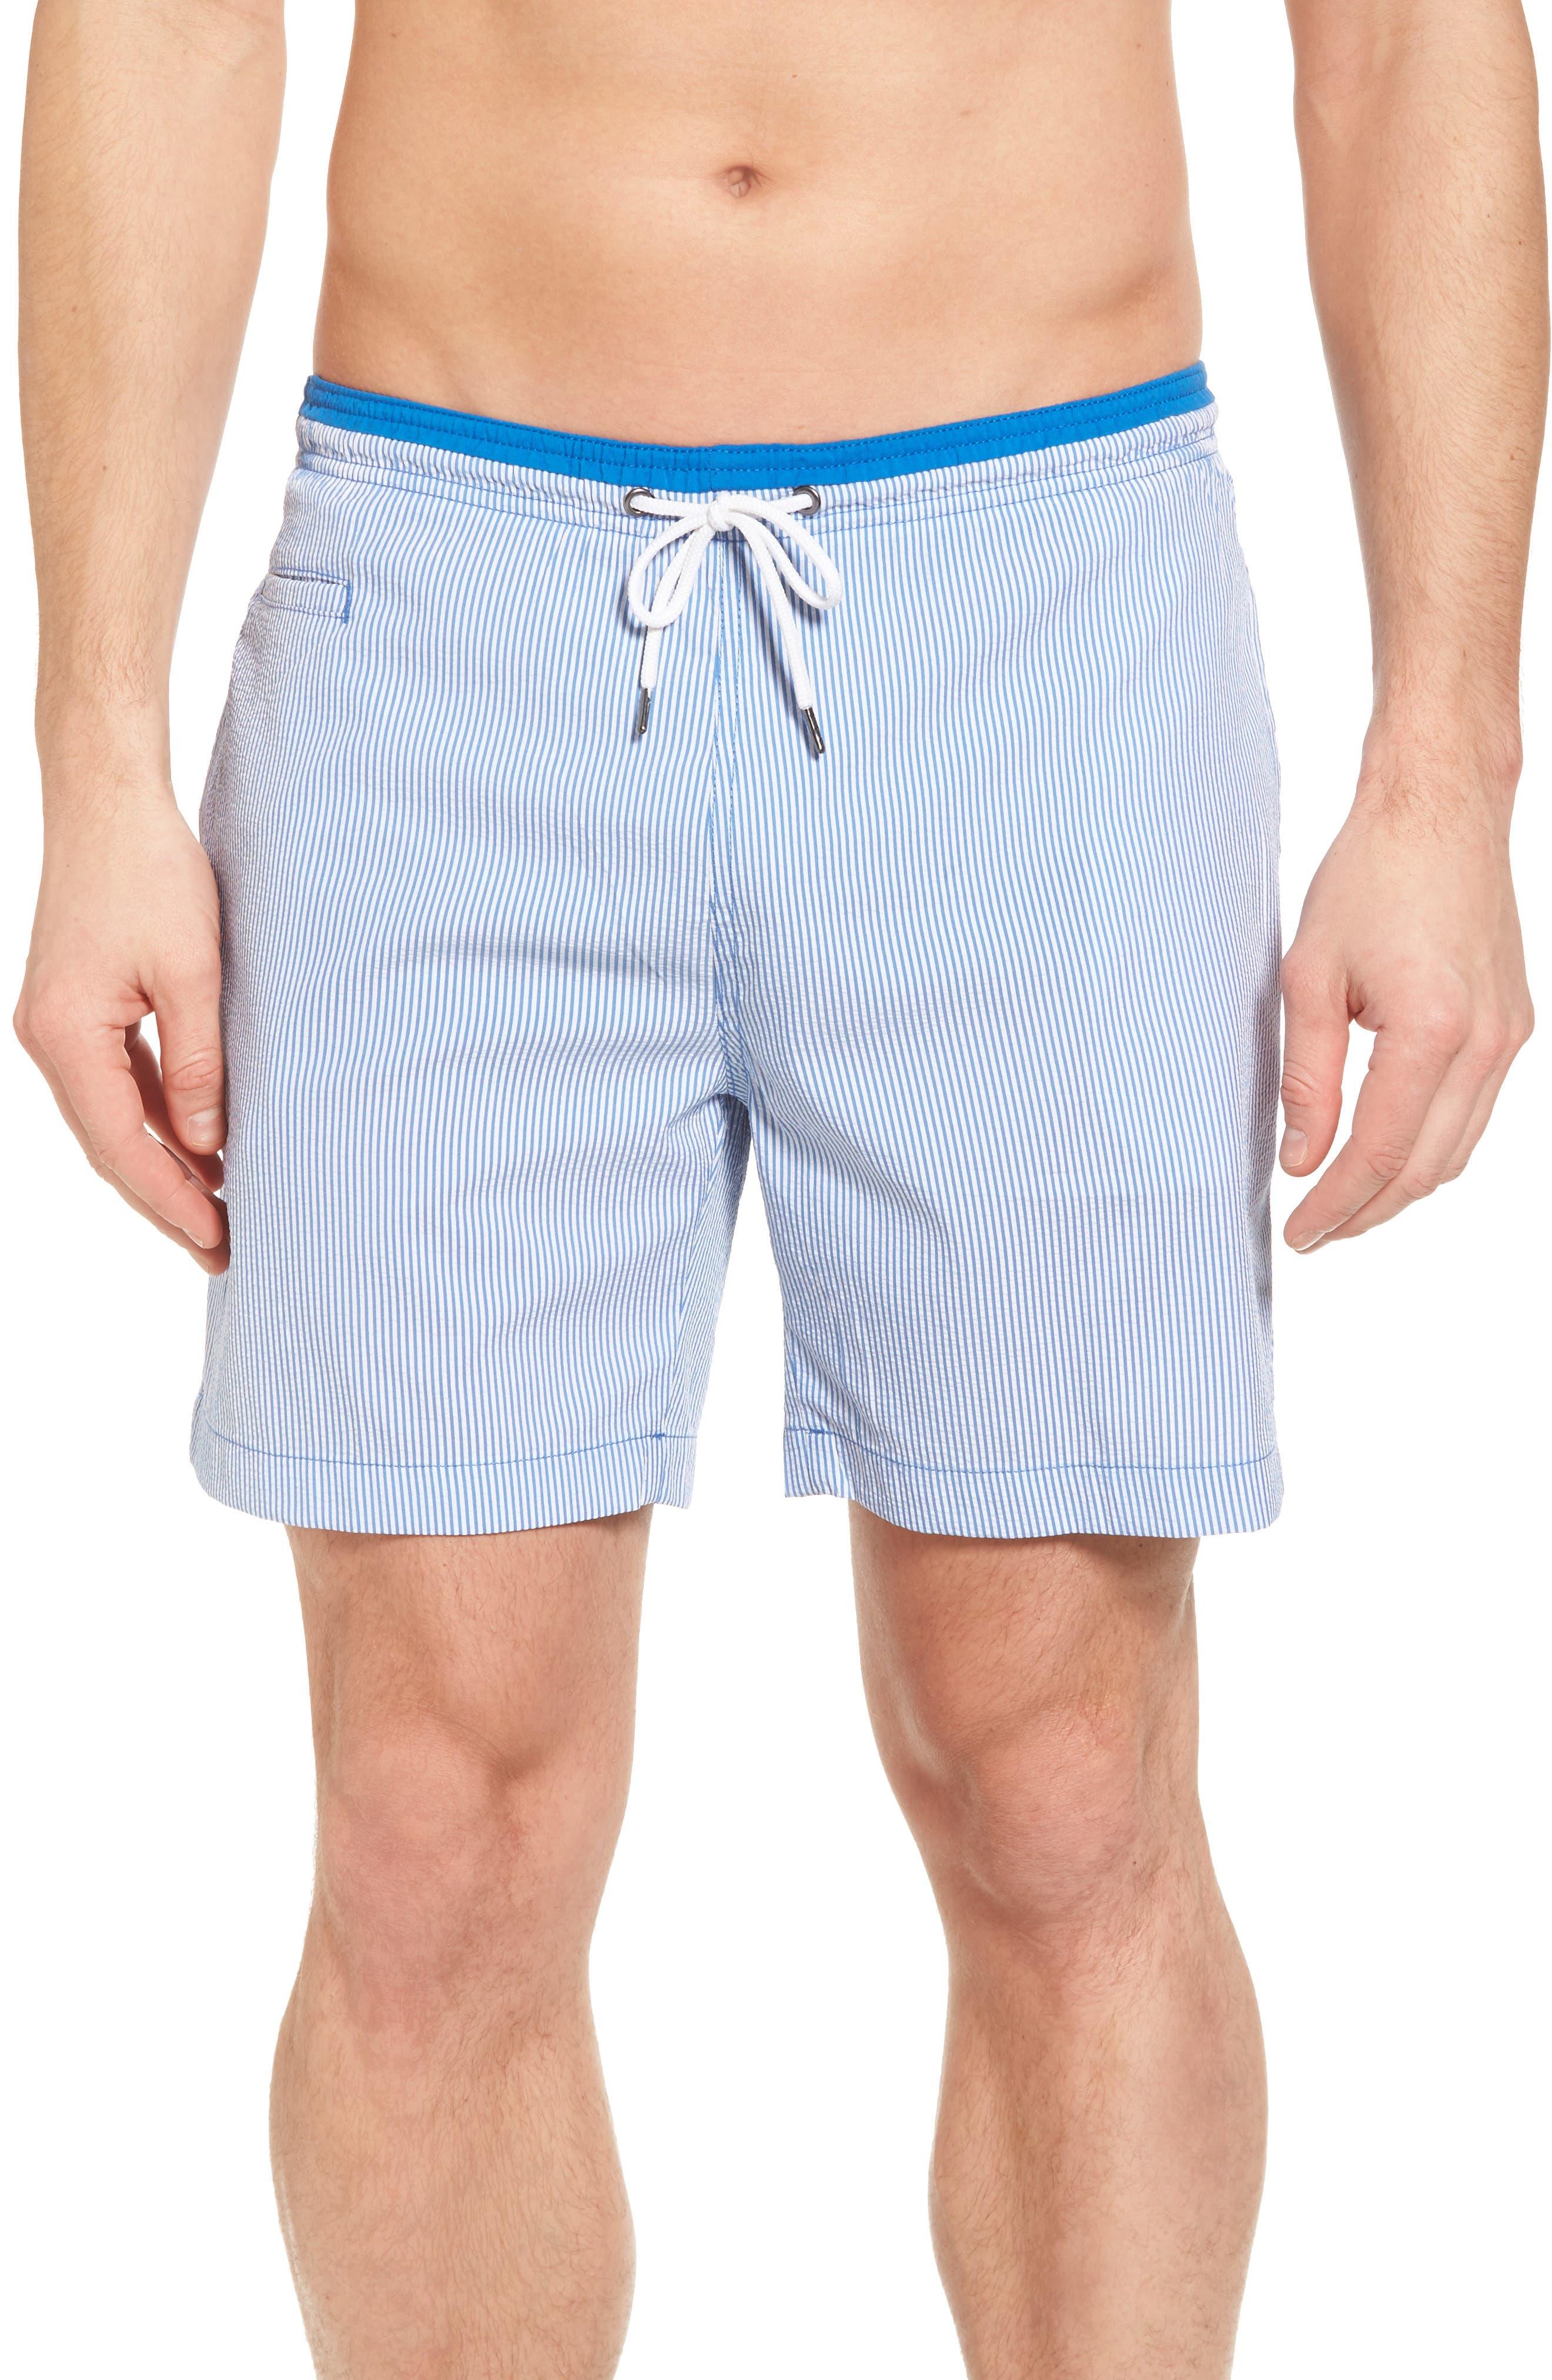 San O Stripe Swim Trunks,                         Main,                         color, Nautical Blue/ White